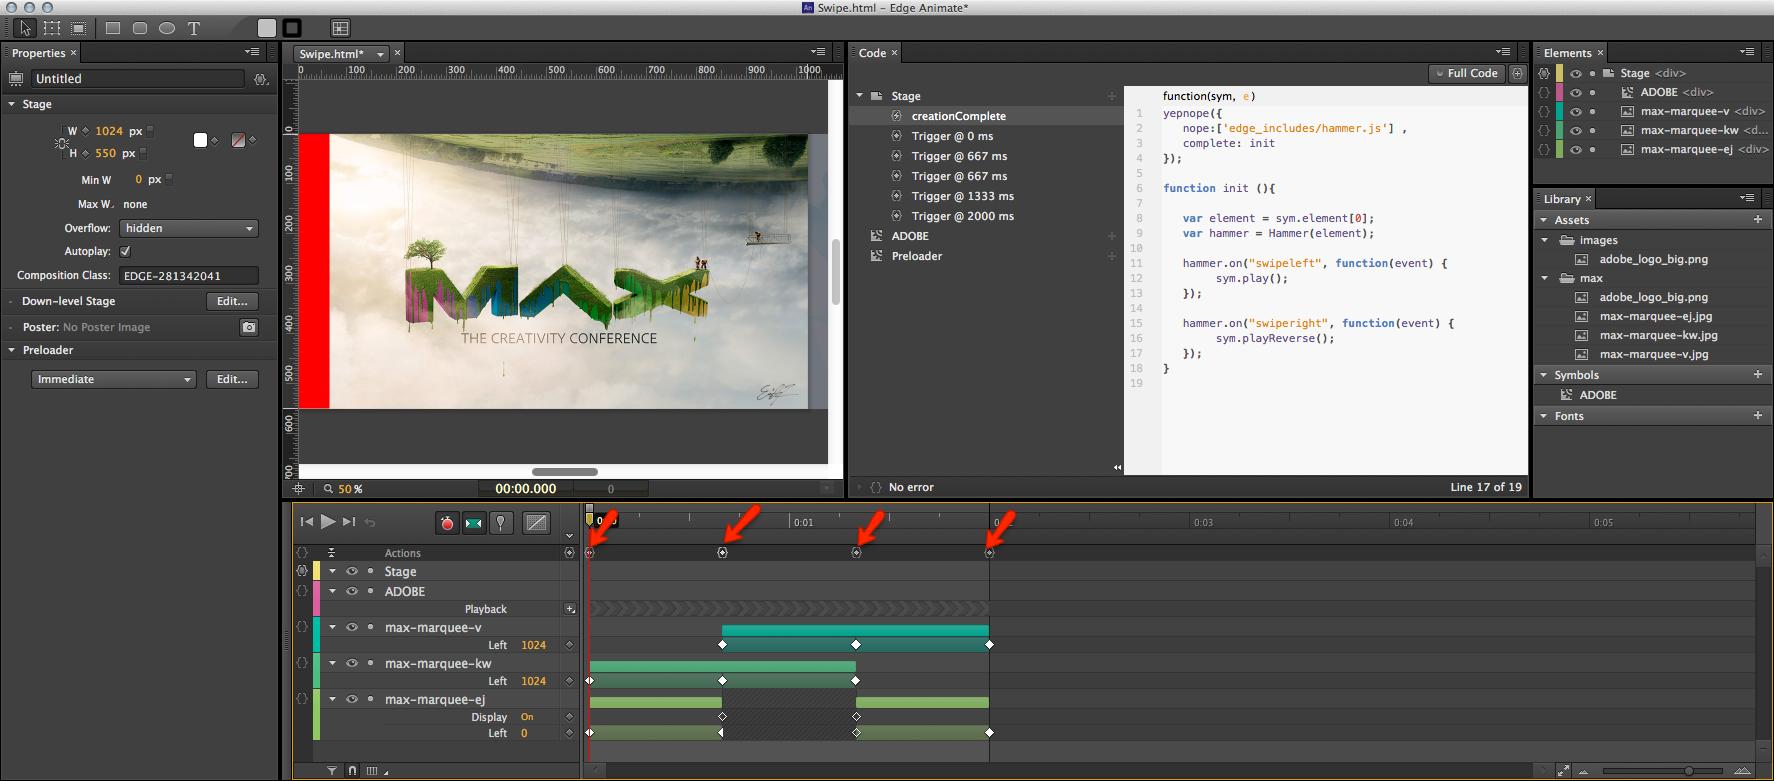 Enabling Gestures in Edge Animate Compositions - DZone Web Dev